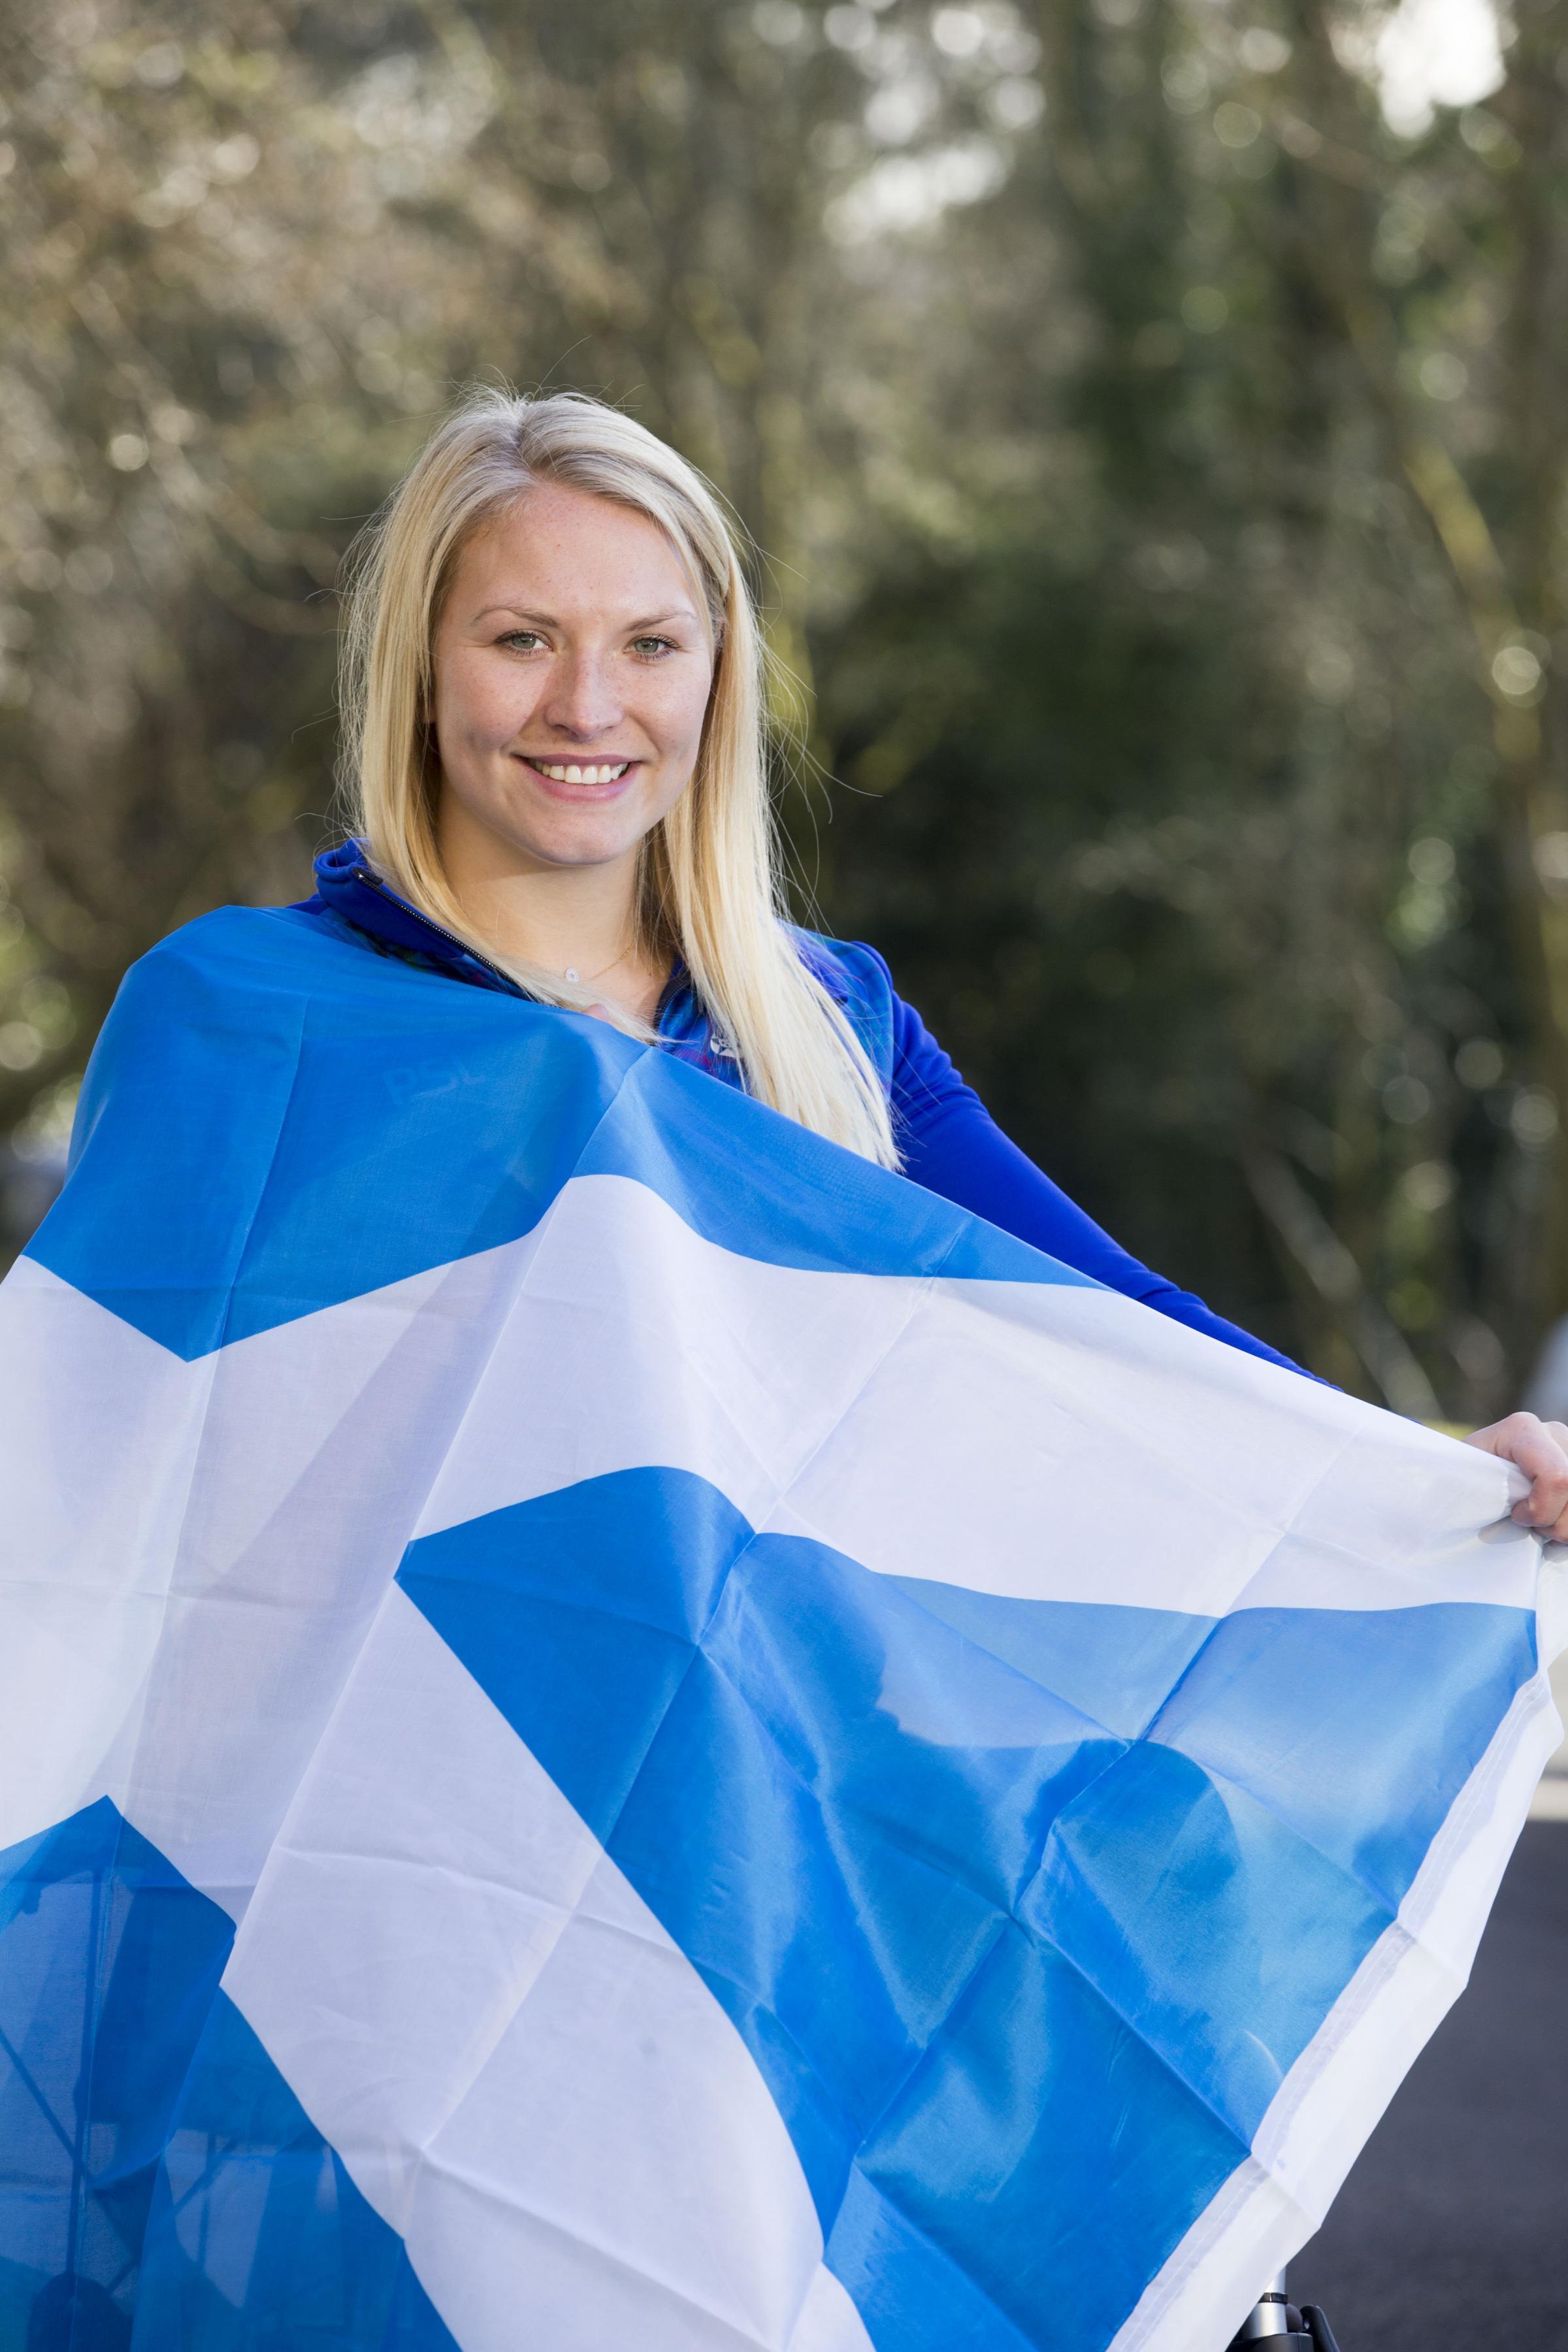 Scottish XC attracts Olympic stars